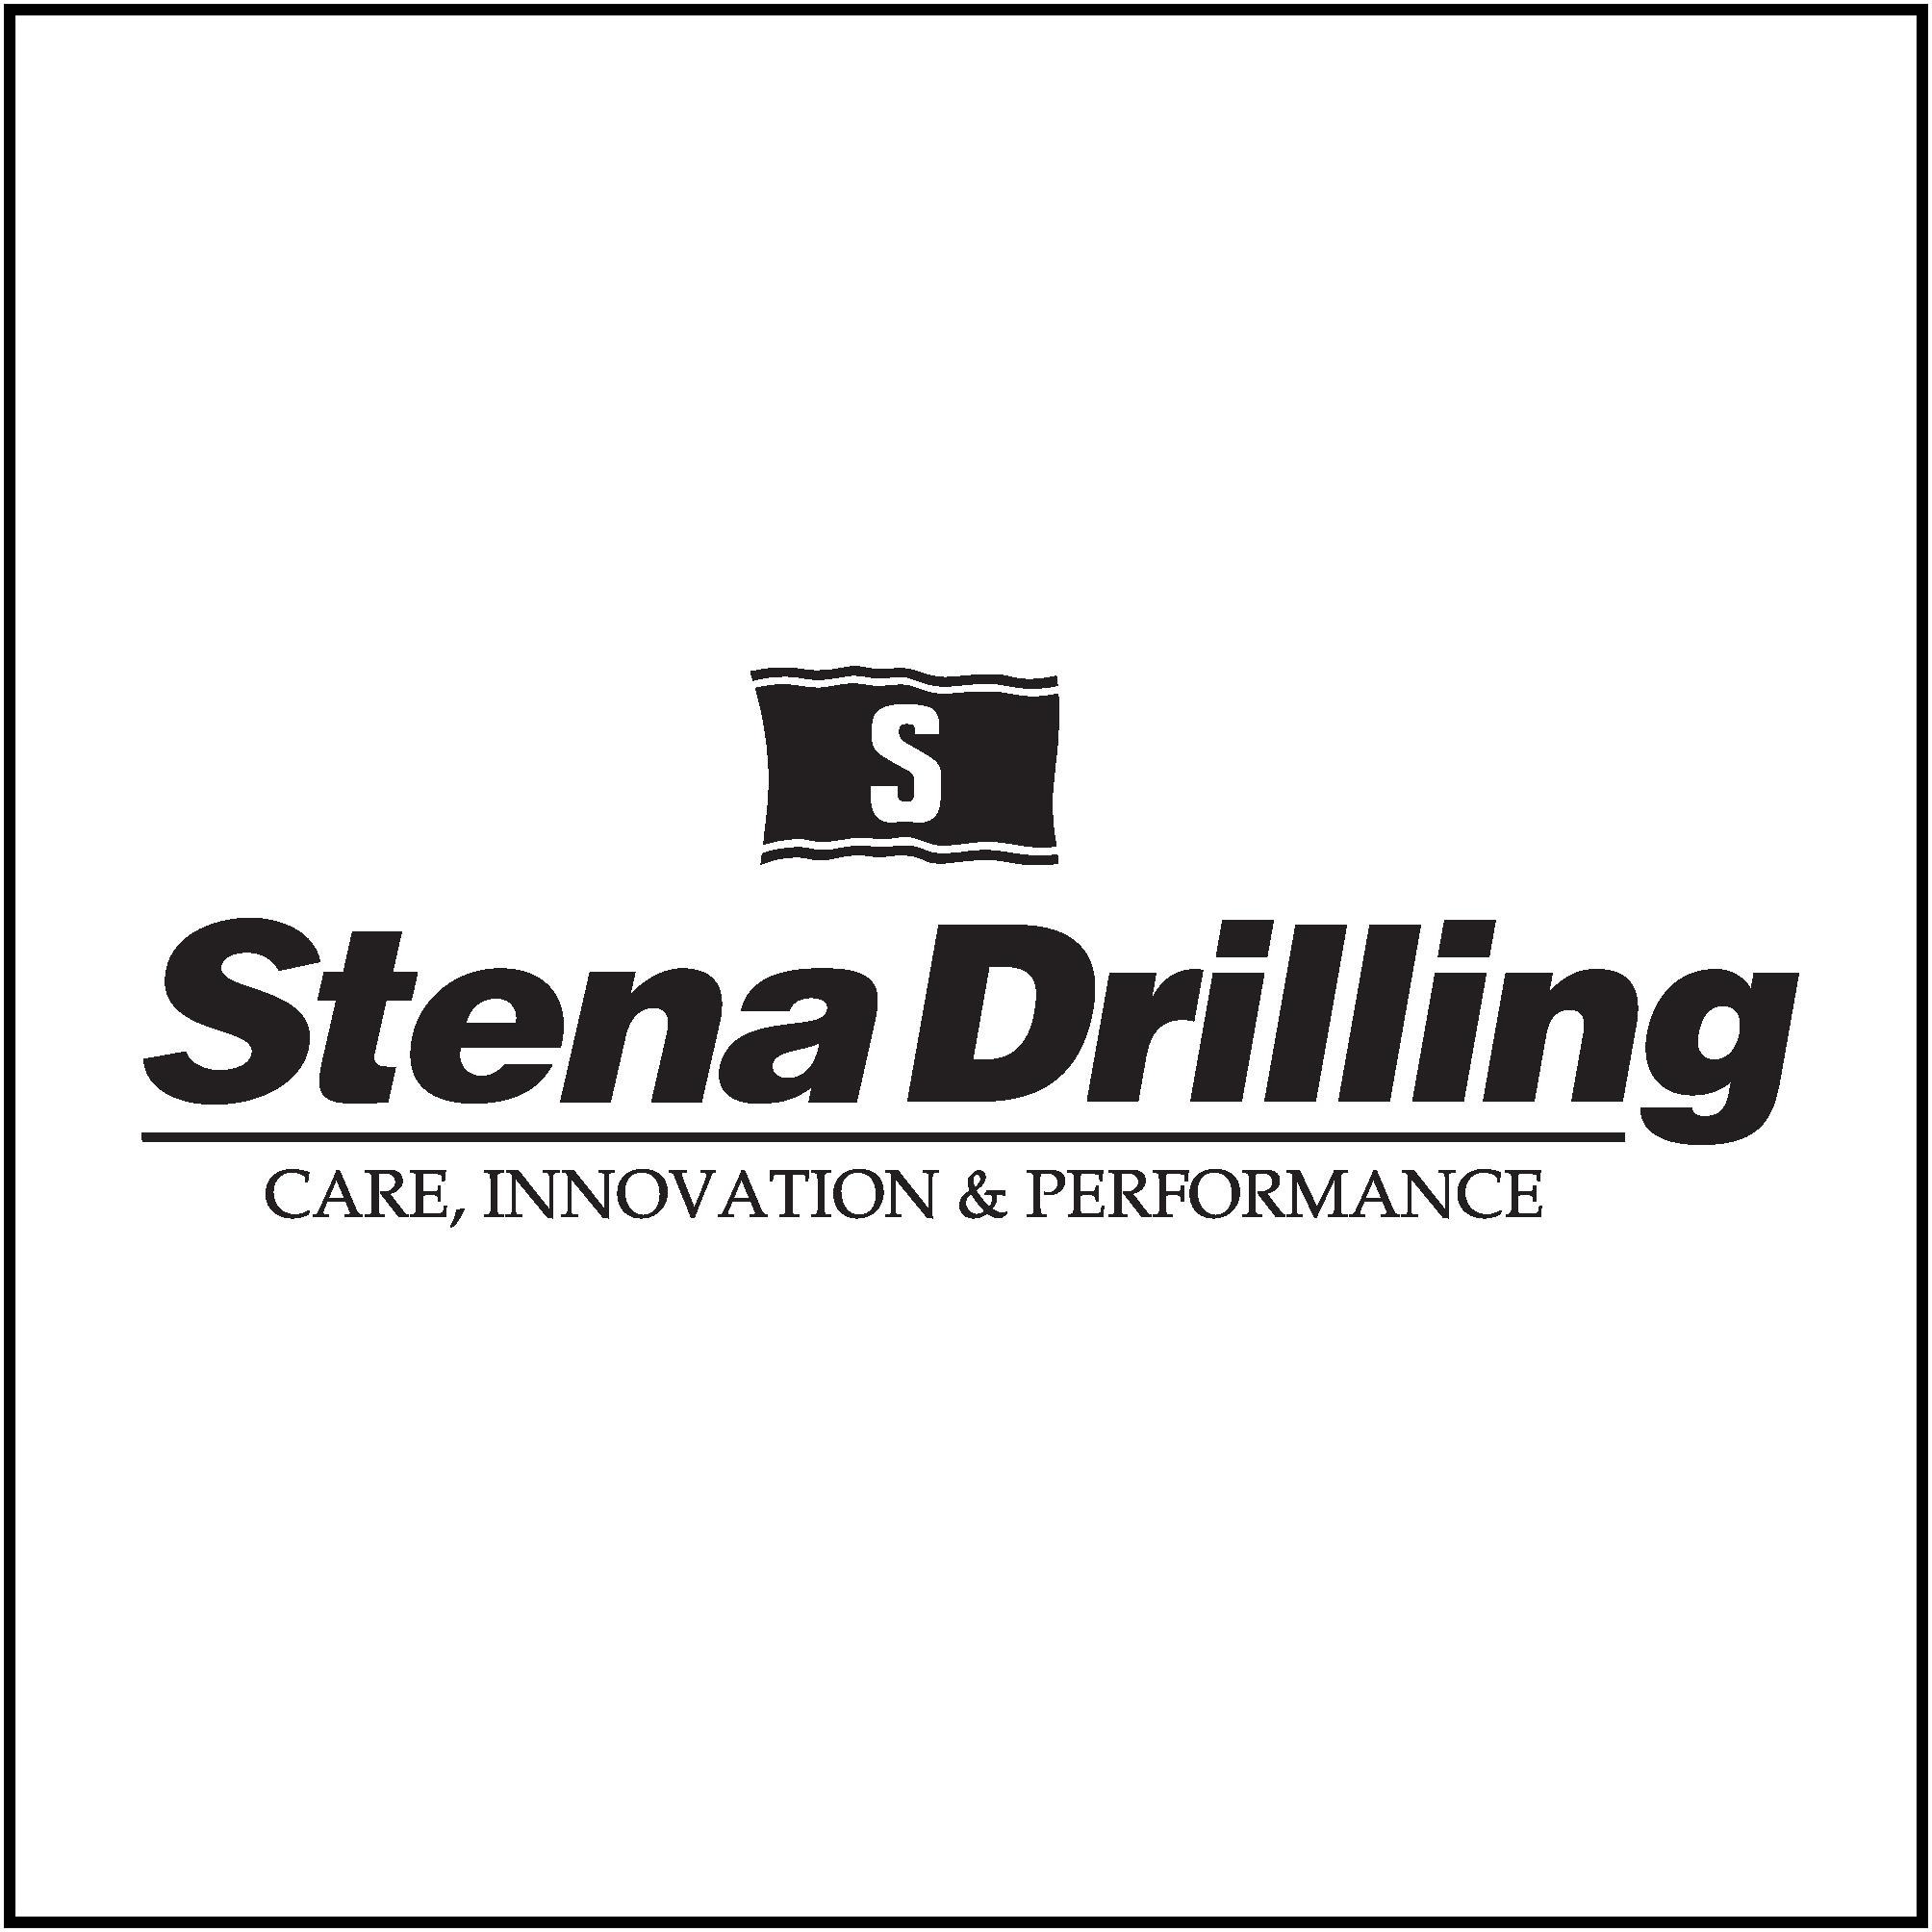 Stena Drilling logo